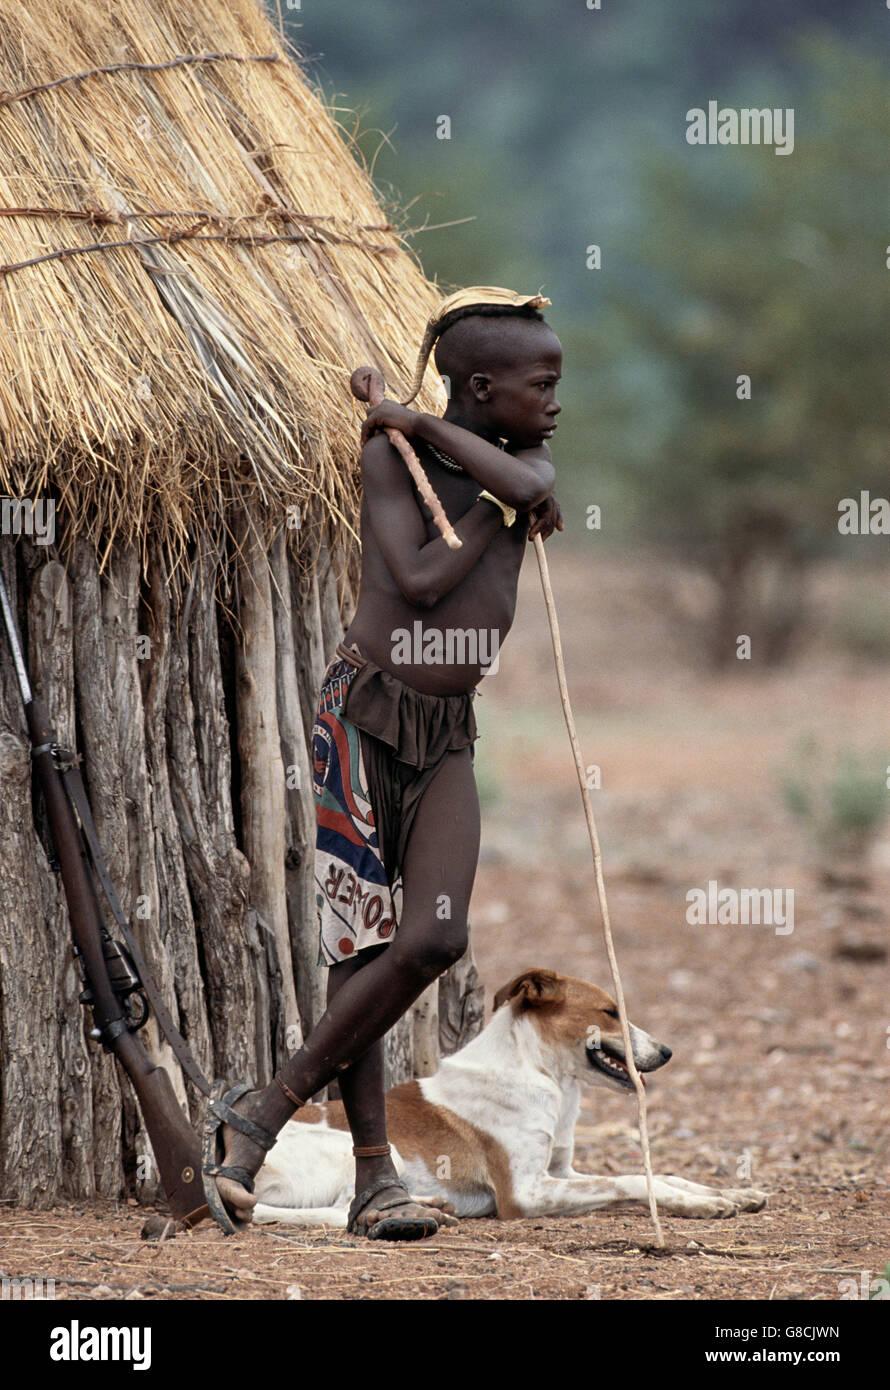 Little Himba boy, Namibia. Art. - Stock Image